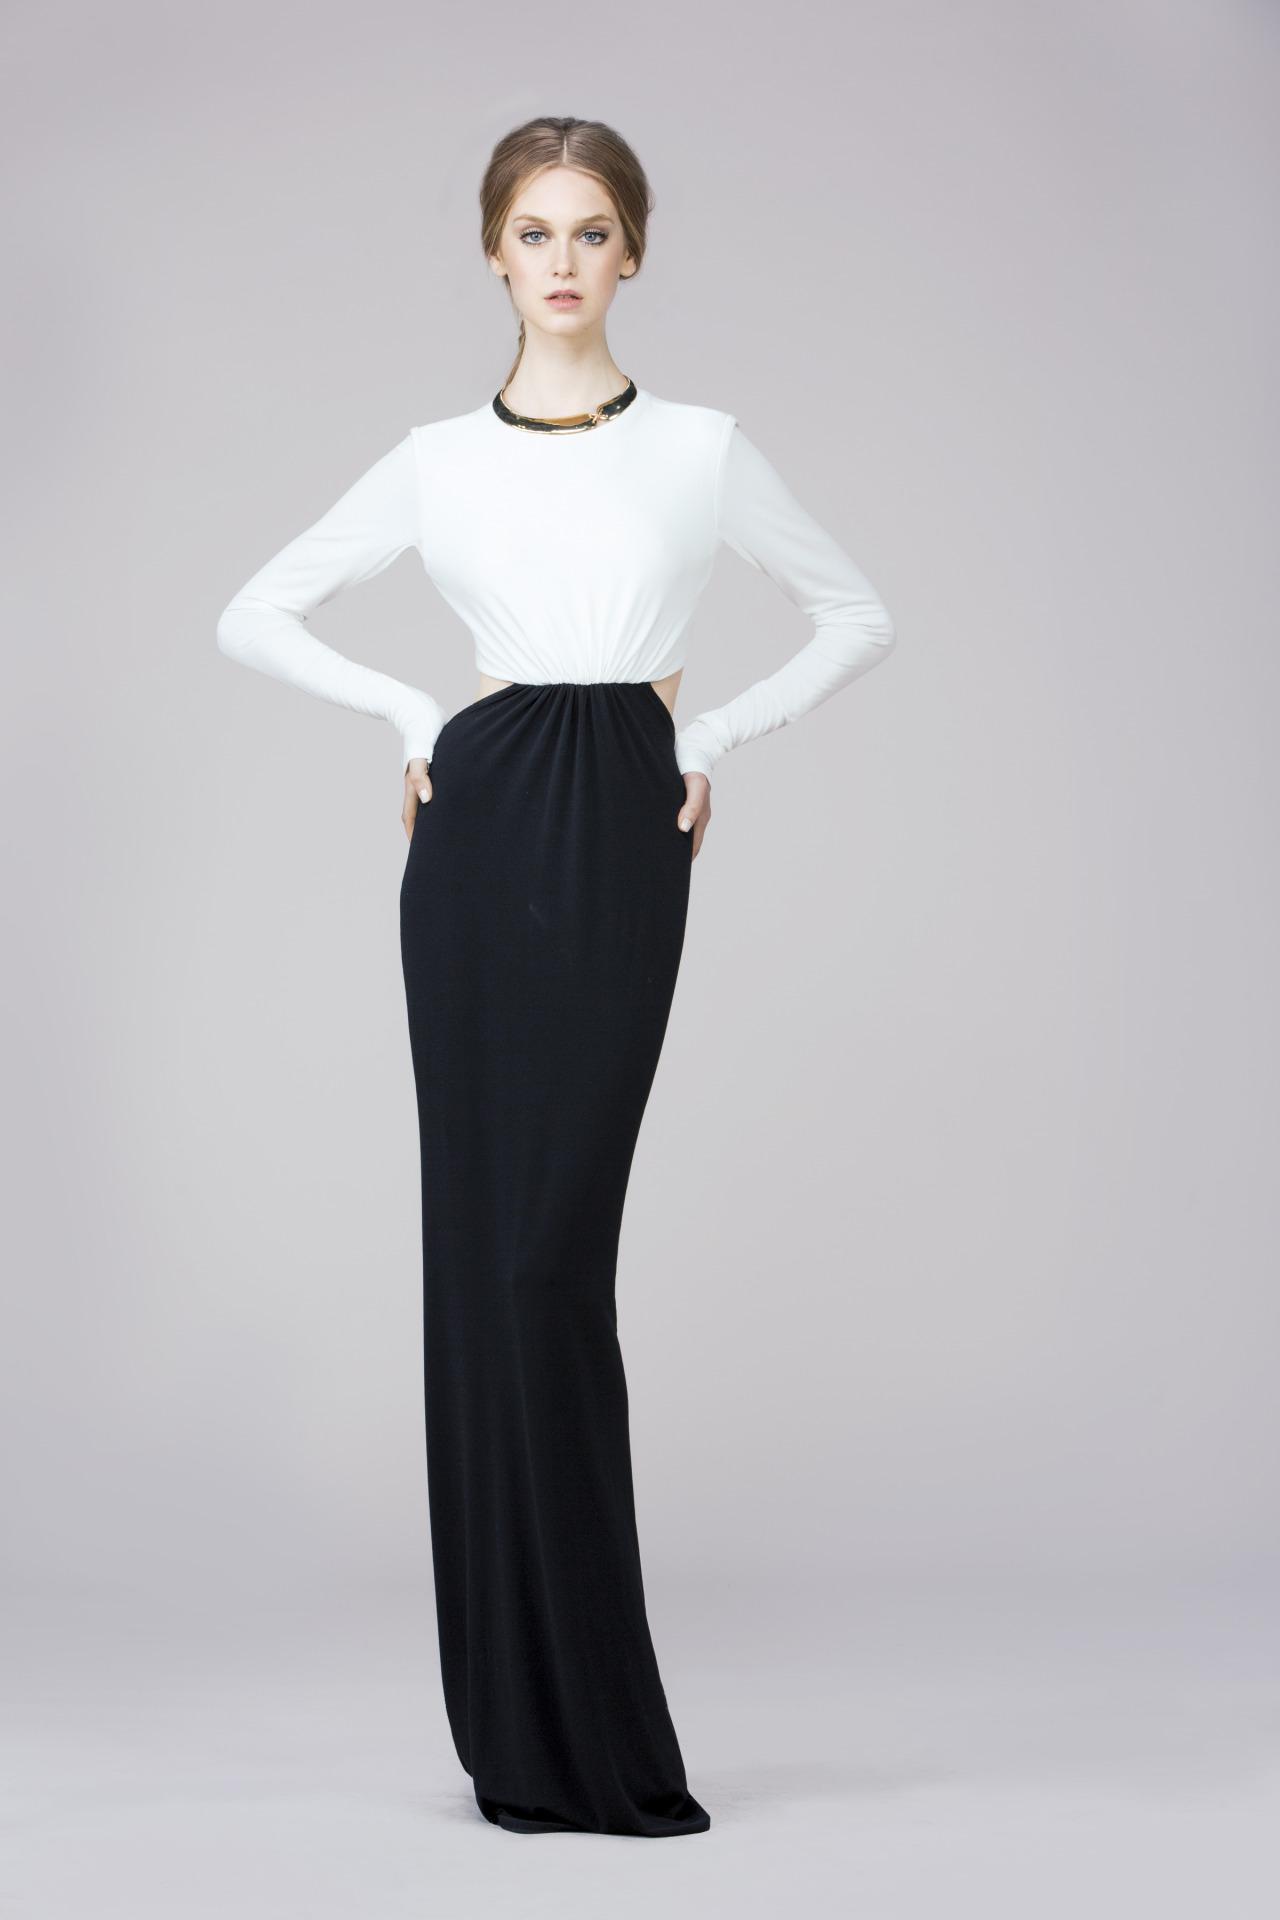 rachelzoe: Rachel Zoe Fall 2014 modern, elegant, simple